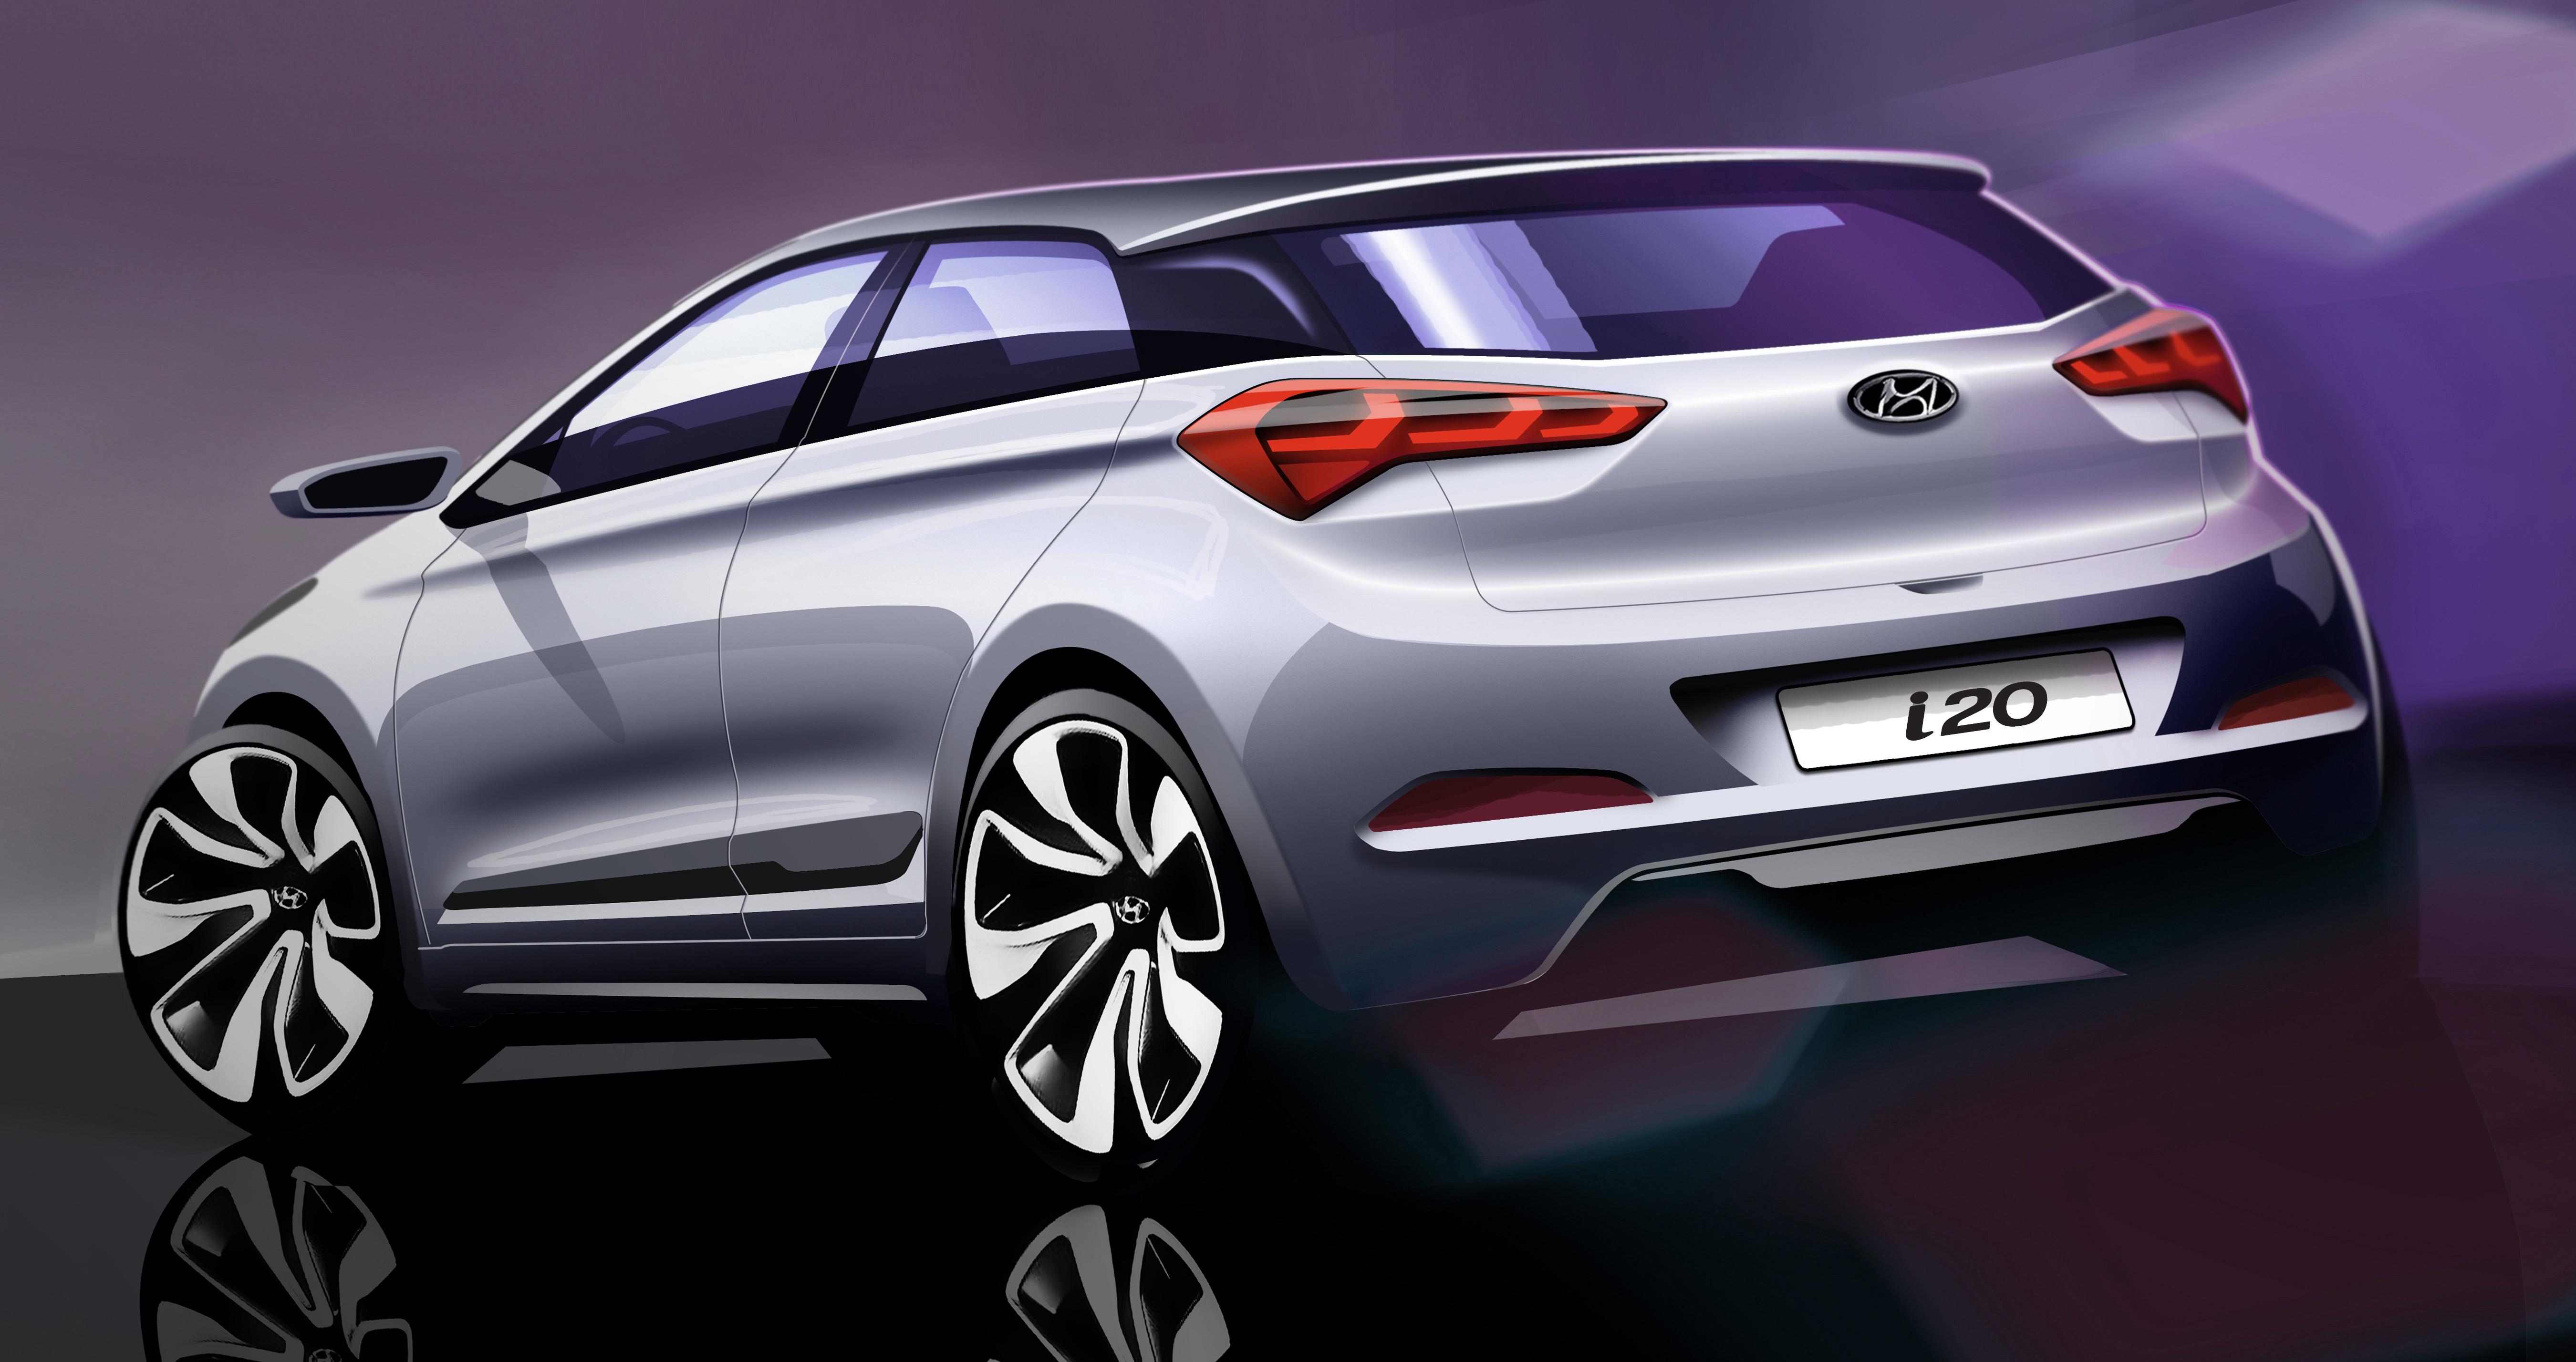 Hyundai: anteprima Nuova Generazione i20